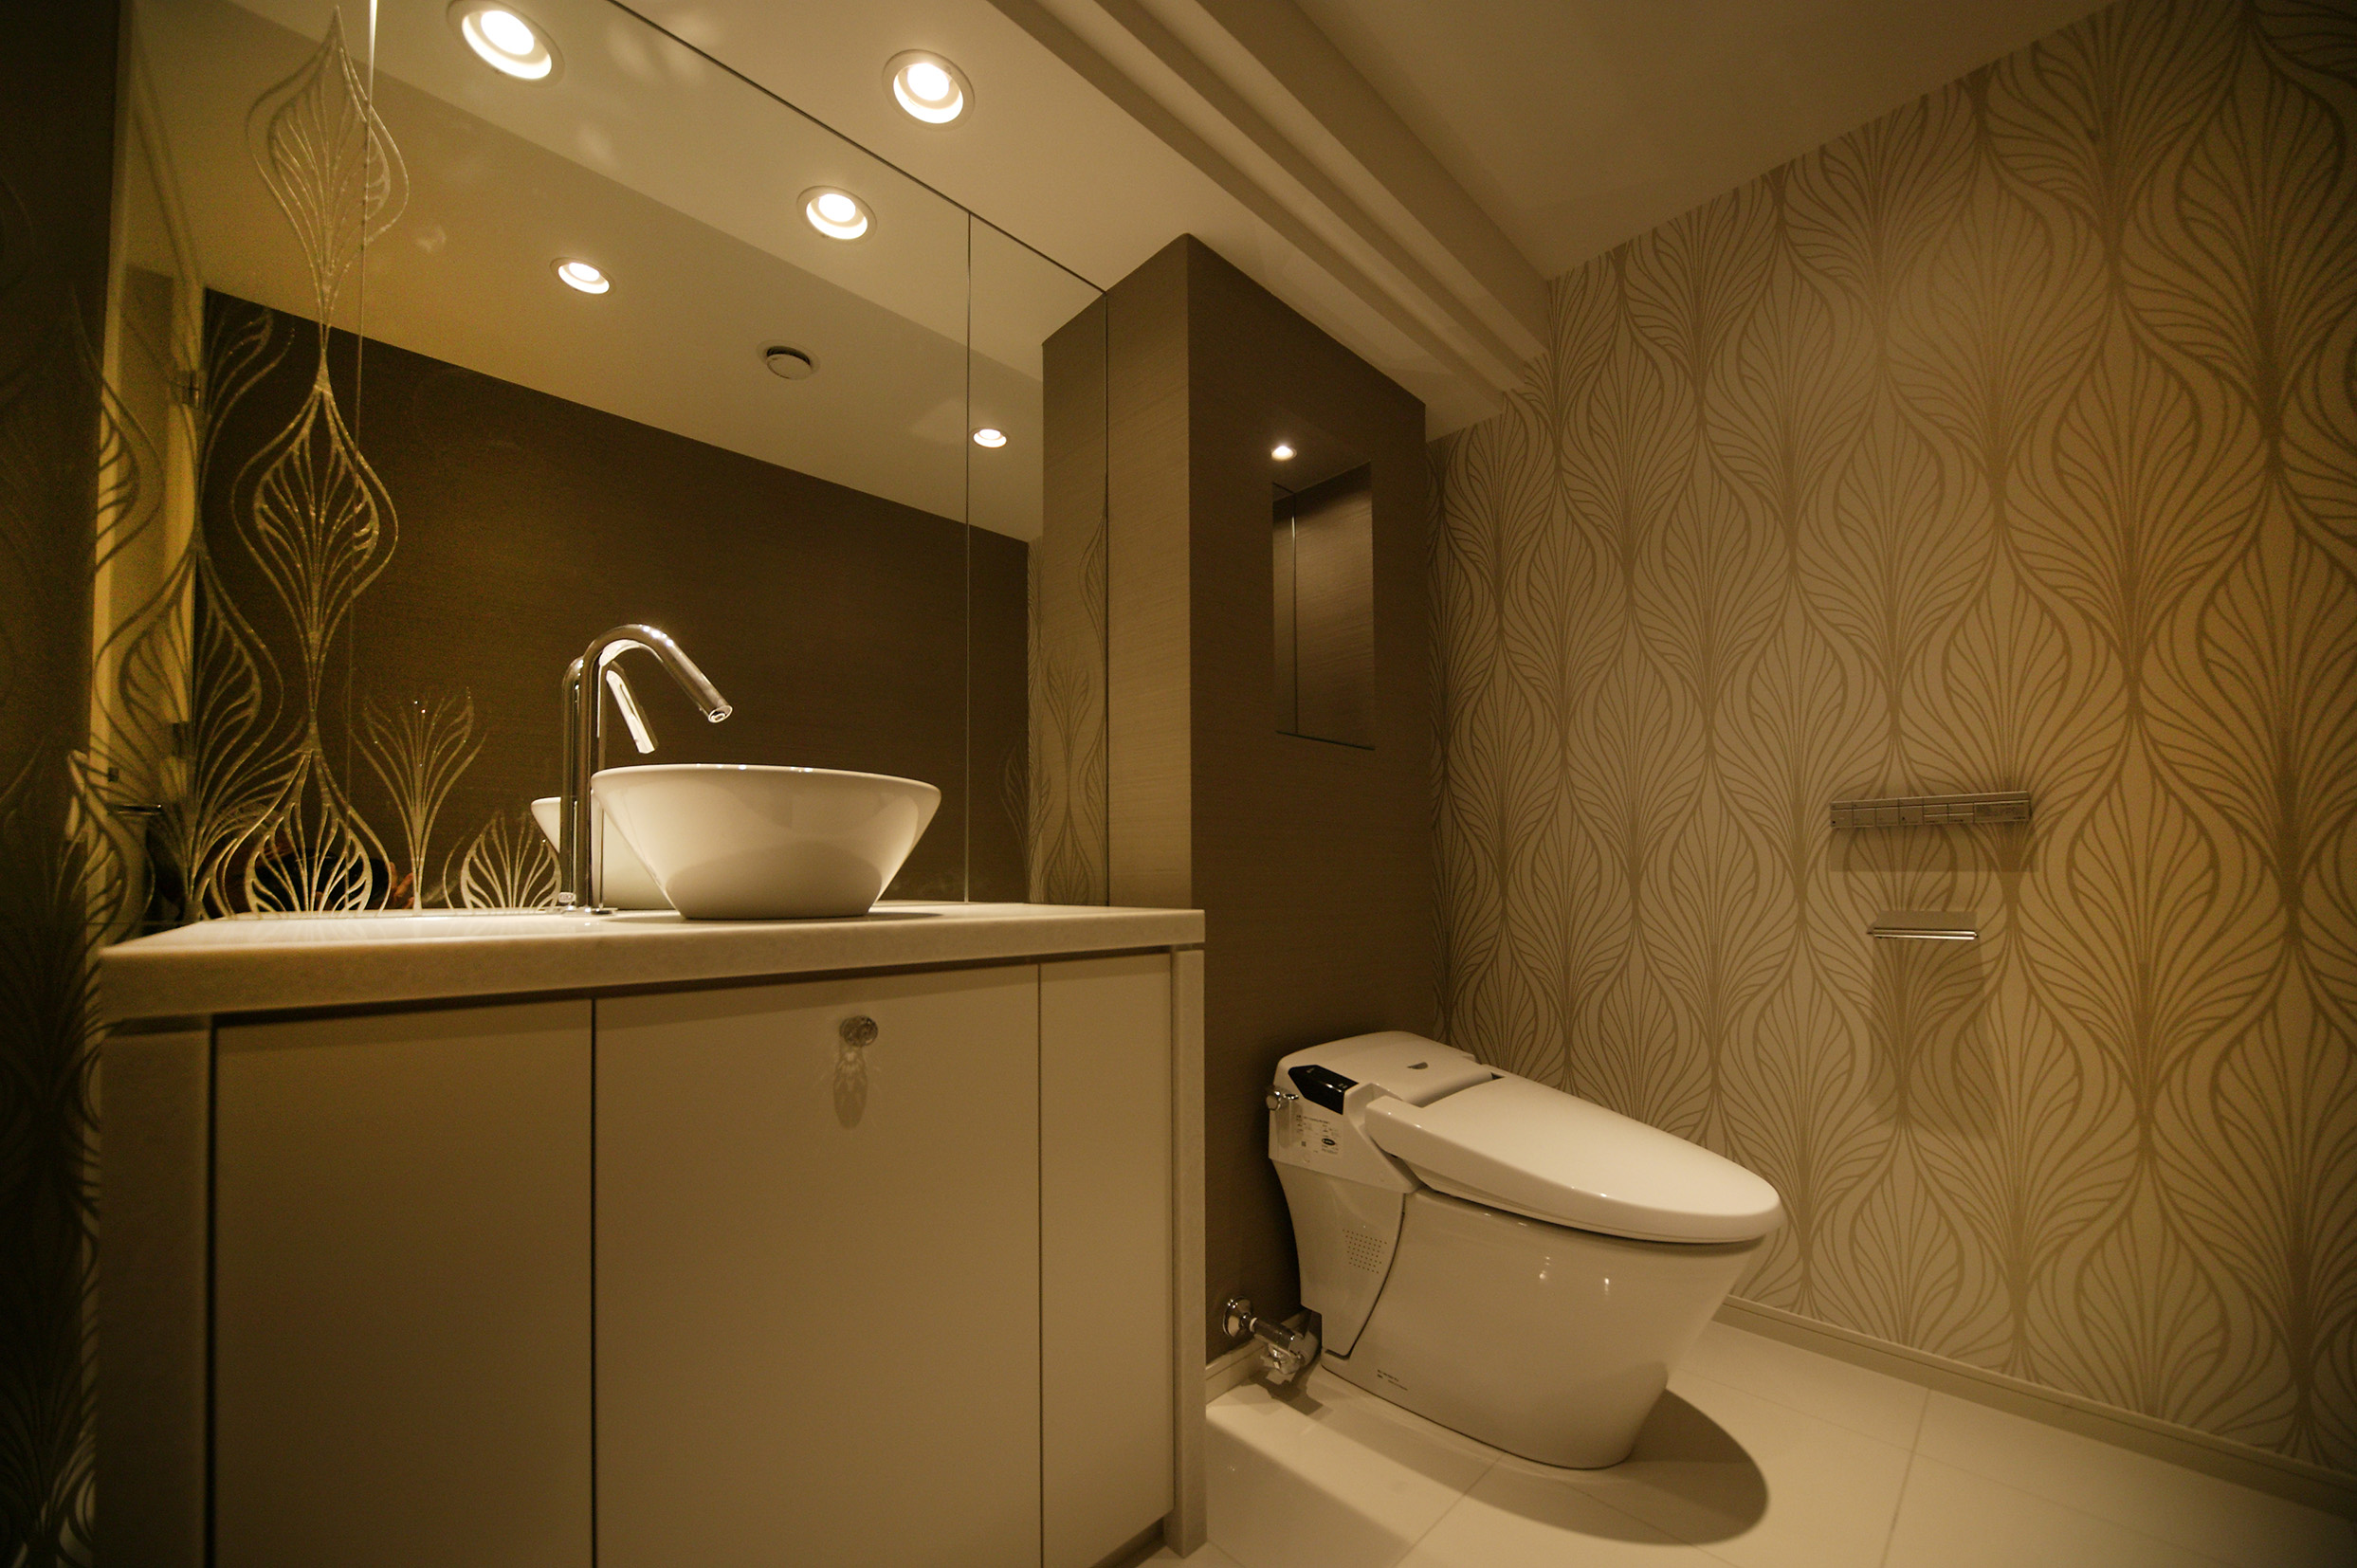 Washroom, etched glass